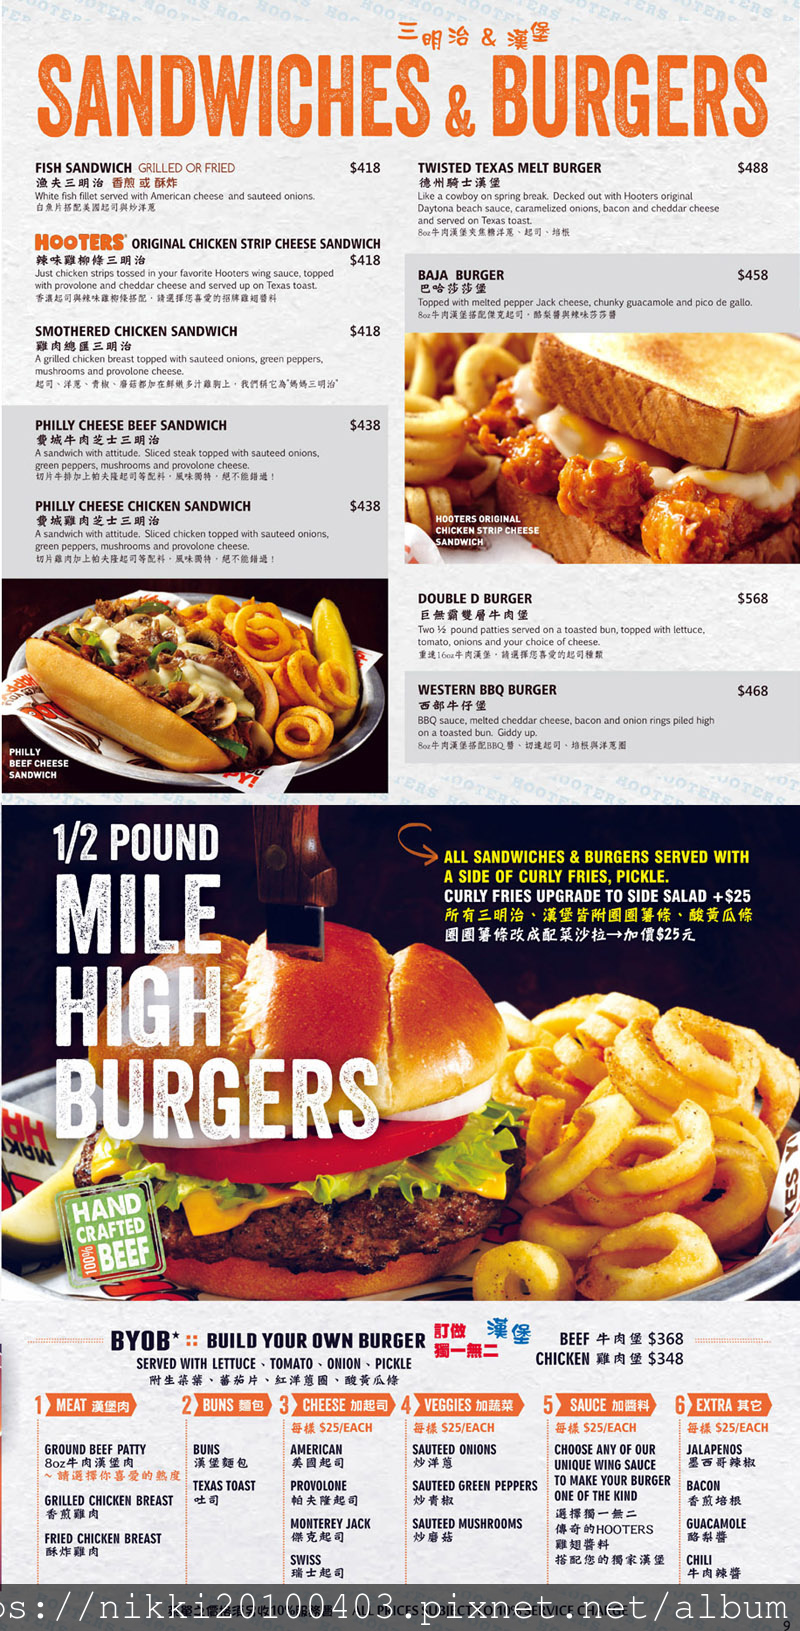 Web burger.jpg